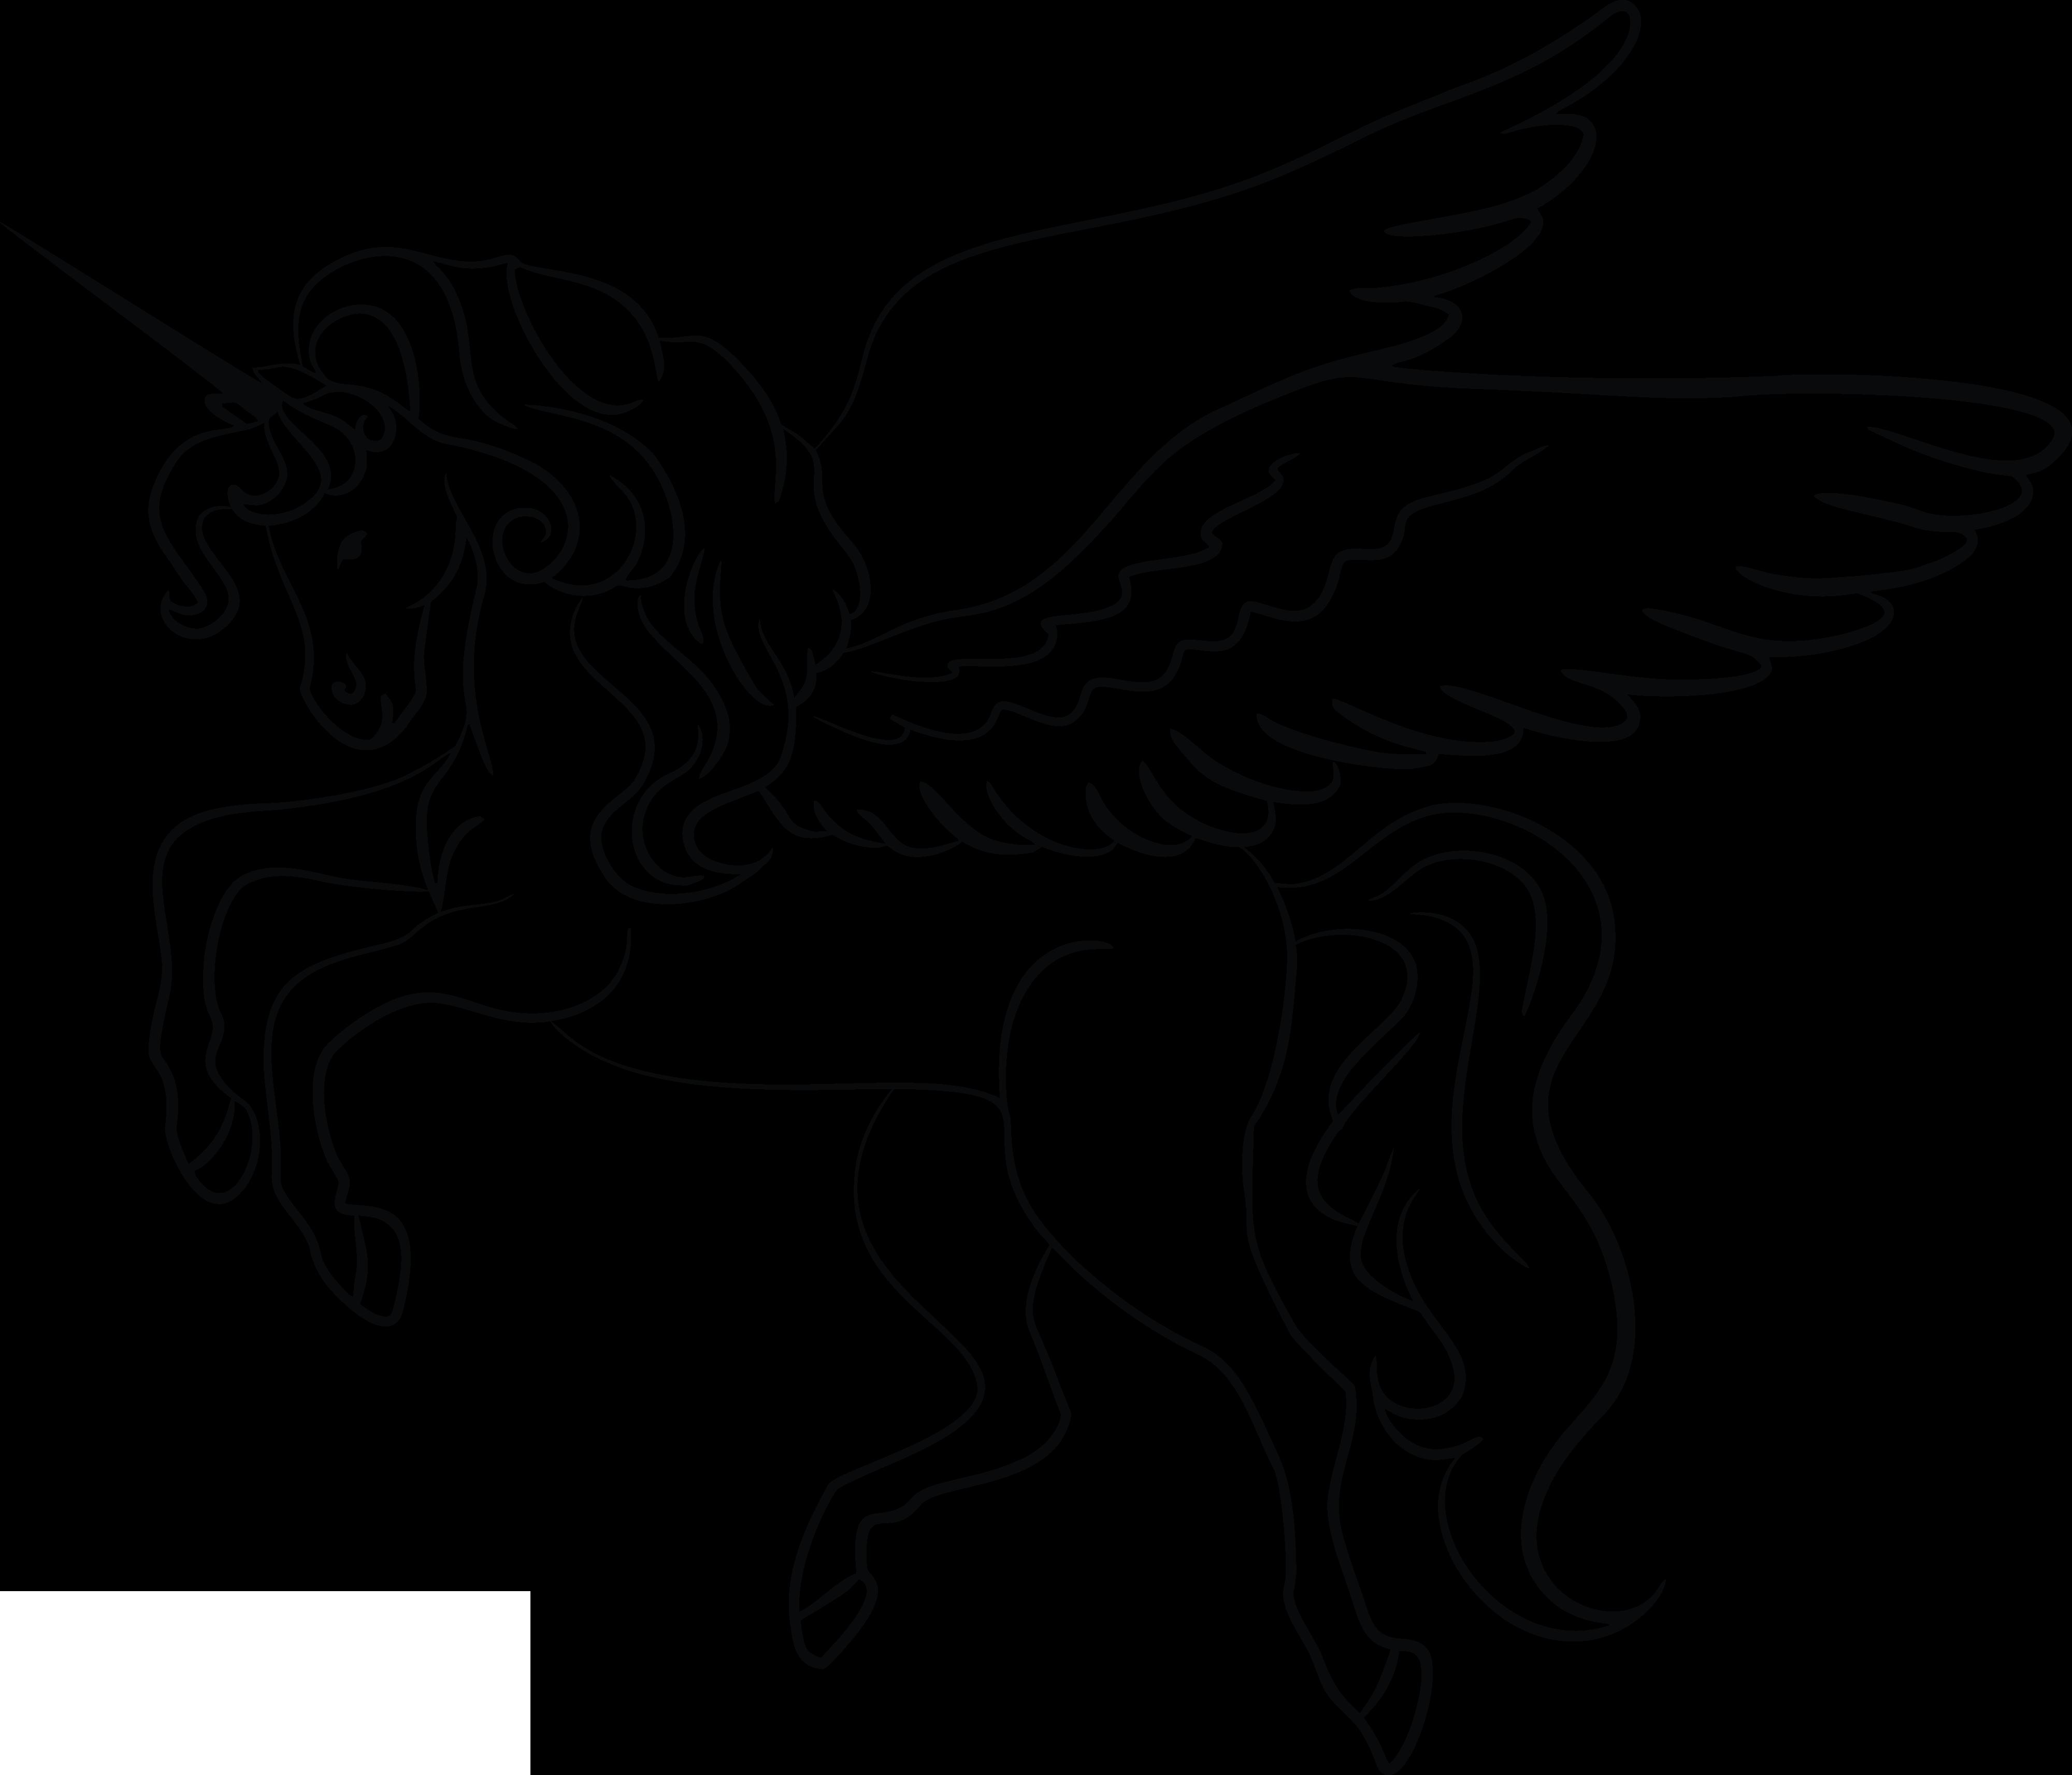 54 Unicorn Black And White free clipart.